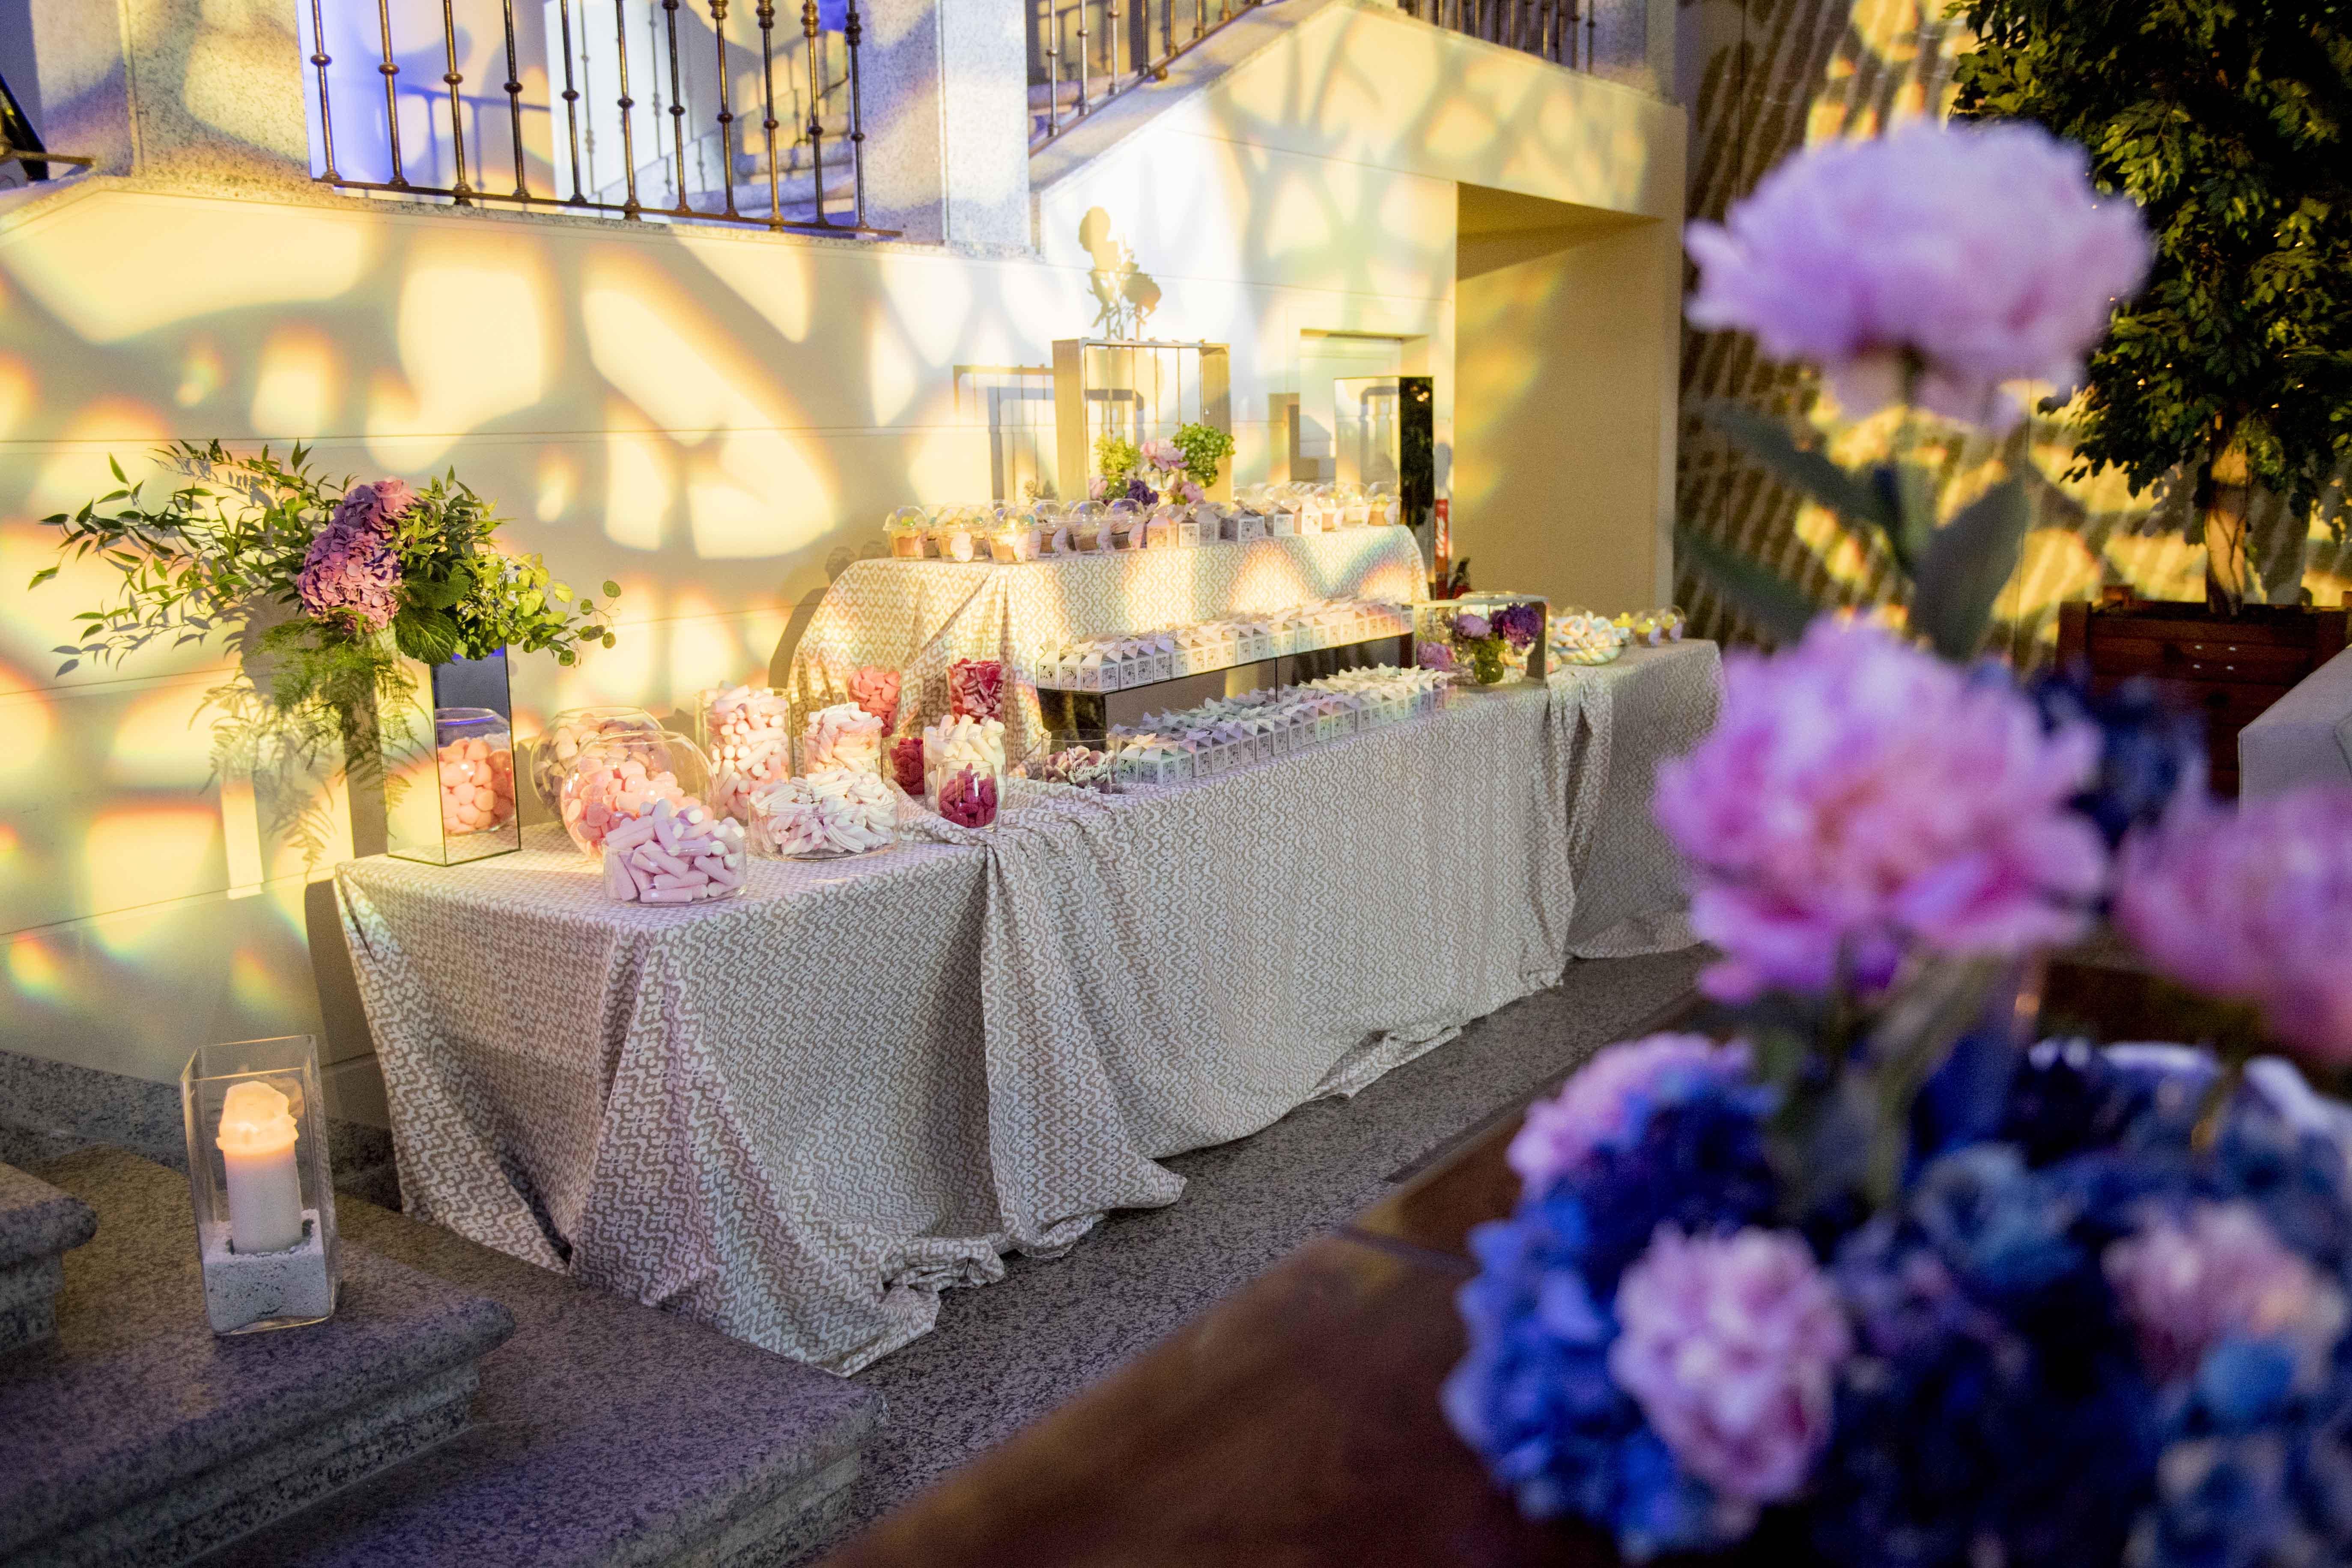 820-bat-mitzvah-2017-daniela-foto-camarote-de-stunt–alfonso-esteban-_stb3614